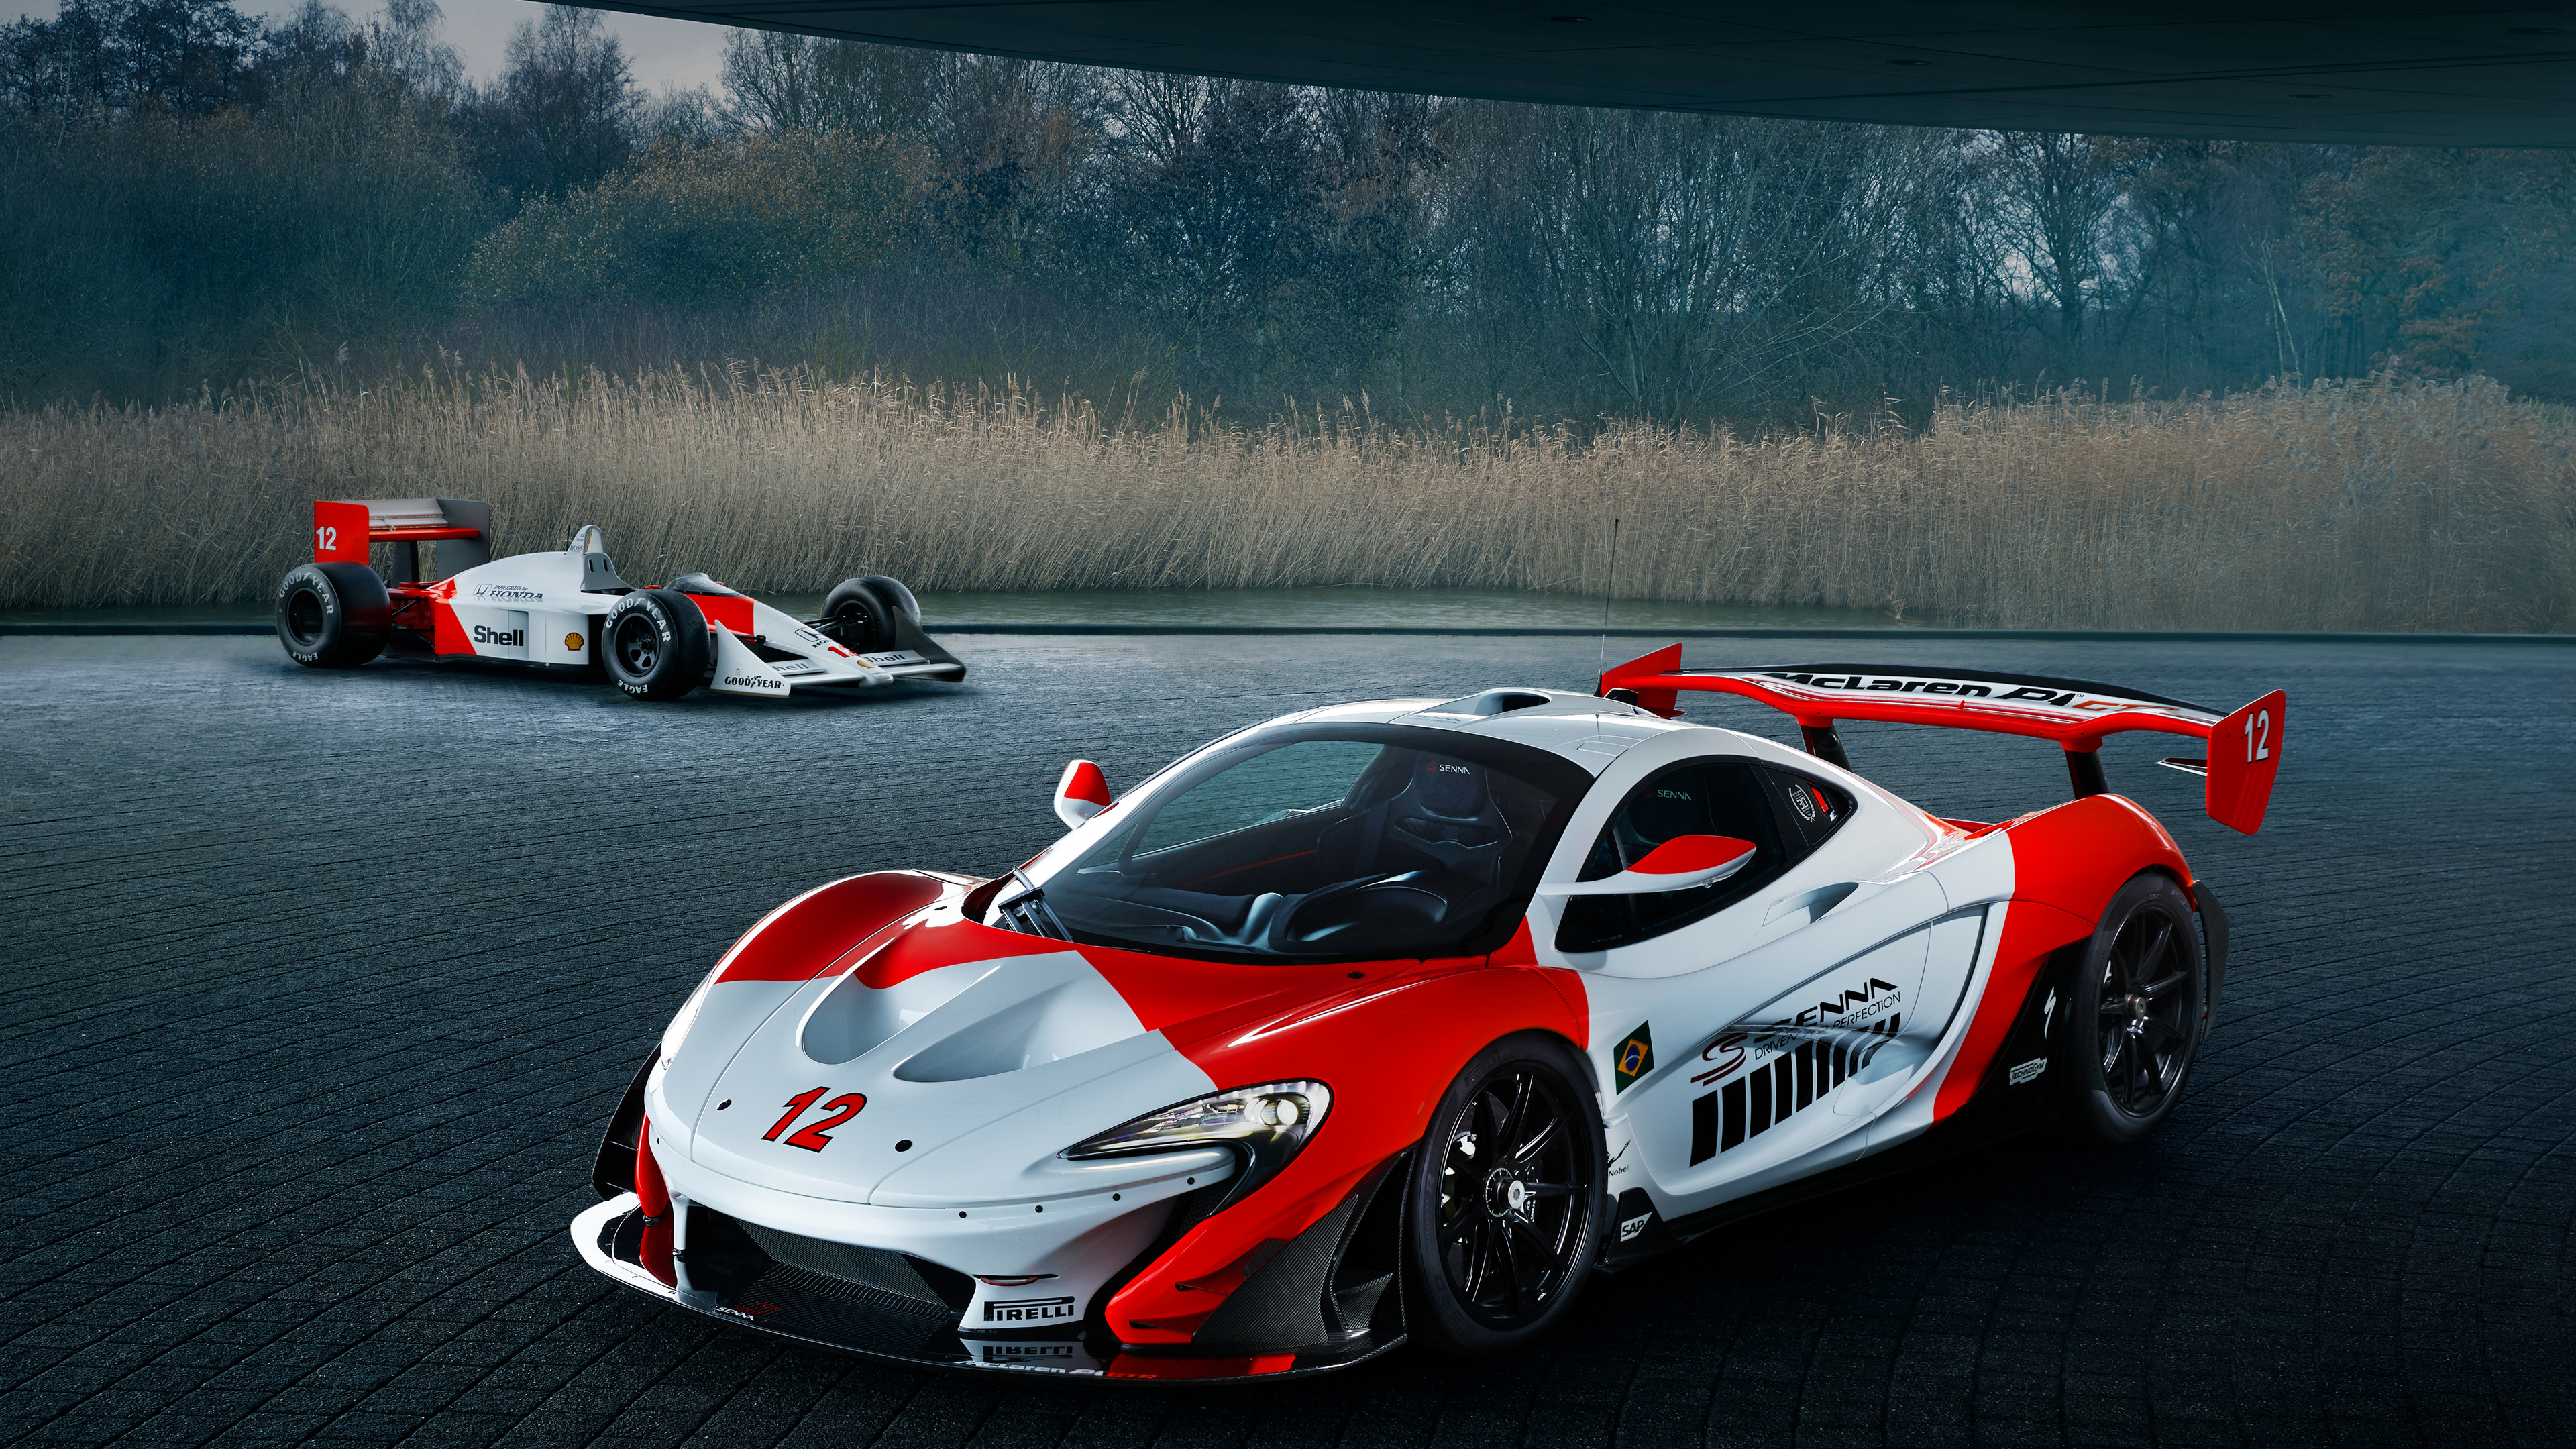 mclaren mso p1 gtr ayrton senna 2018 4k 1546362398 - McLaren MSO P1 GTR Ayrton Senna 2018 4k - mclaren wallpapers, hd-wallpapers, cars wallpapers, 4k-wallpapers, 2018 cars wallpapers